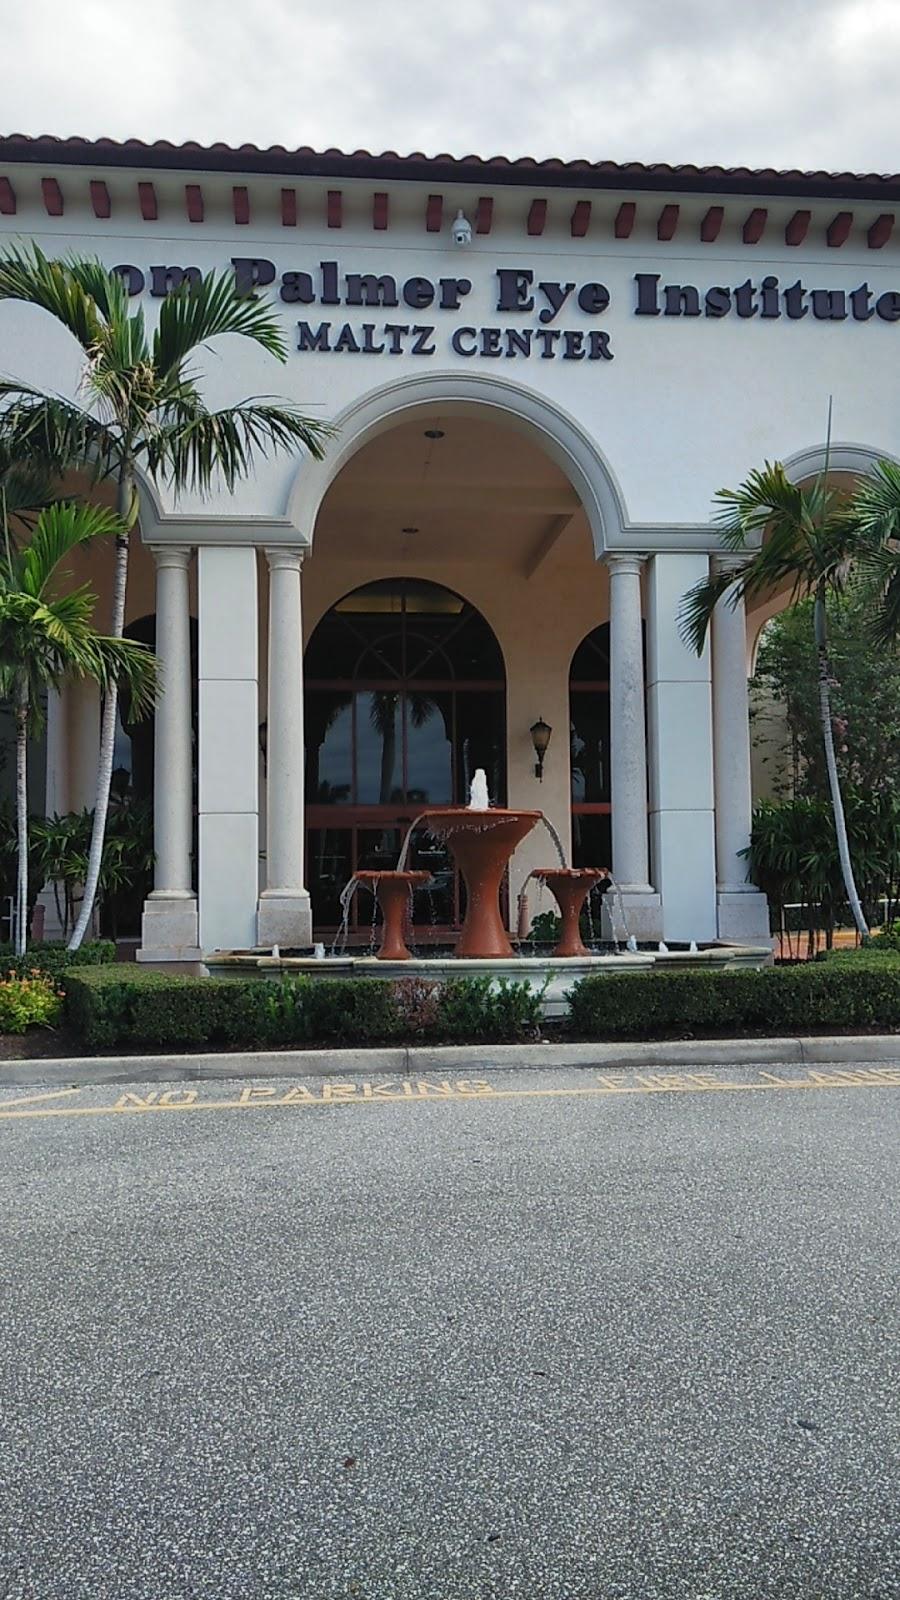 Bascom Palmer Eye Institute - doctor  | Photo 8 of 10 | Address: 7101 Fairway Dr, Palm Beach Gardens, FL 33418, USA | Phone: (561) 515-1500